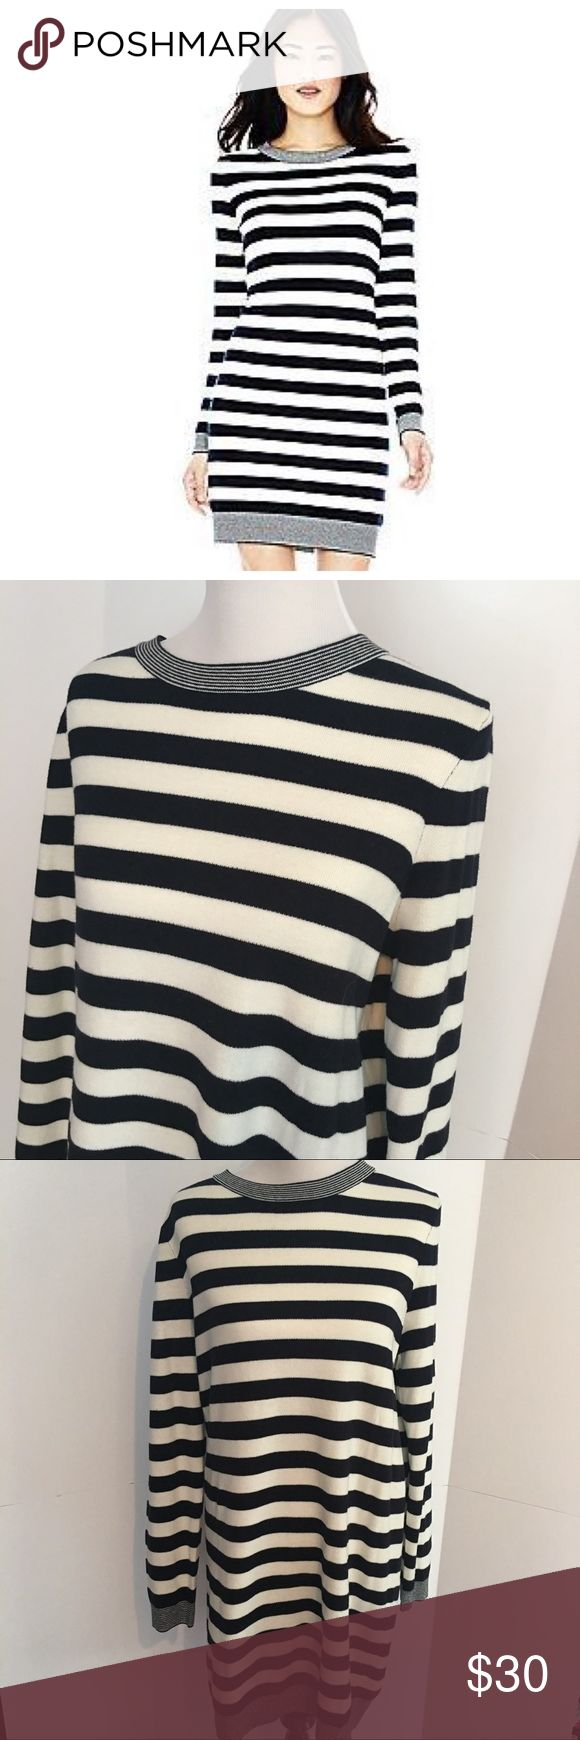 NWT joe fresh striped dress XL Cream and navy stripe sweater dress from joe fresh. Size XL. Never worn NWT. Super cute and functional! Make an offer or bundle and save Joe Fresh Dresses